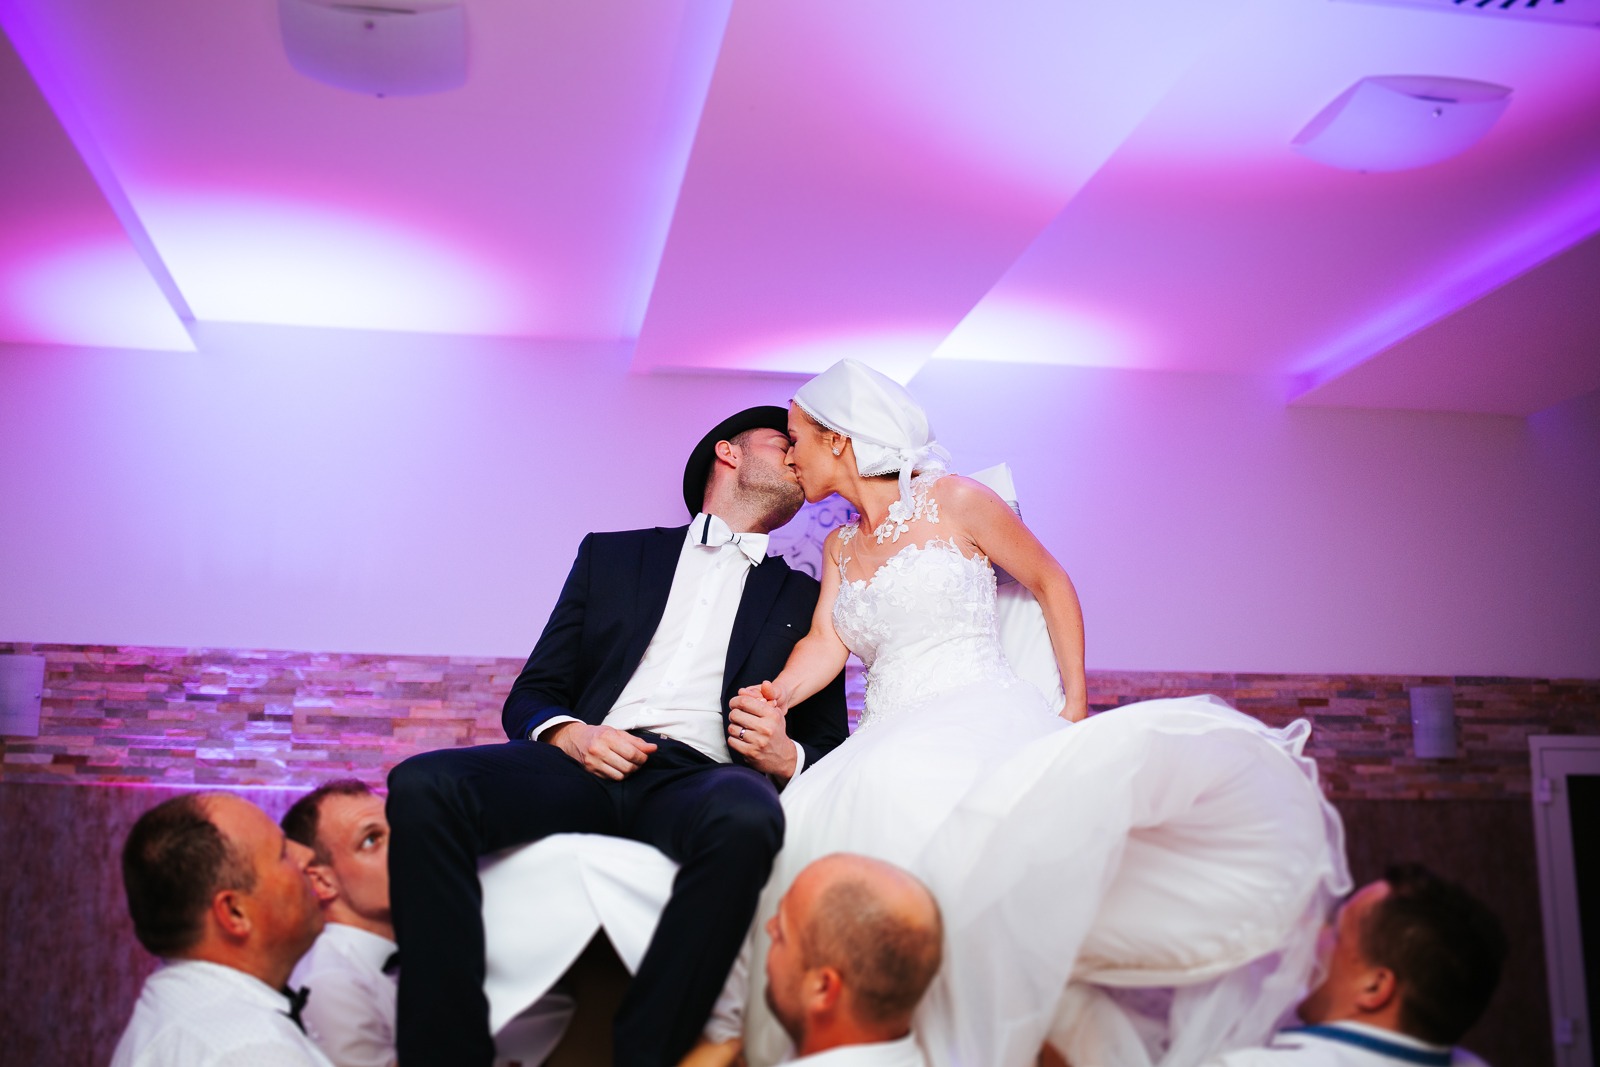 Svadba Lednické Rovne, KMK Restaurant 04 #svadobnyDJ, #djanasvadbu, #svadba, #svadbalednickerovne #lednickerovne